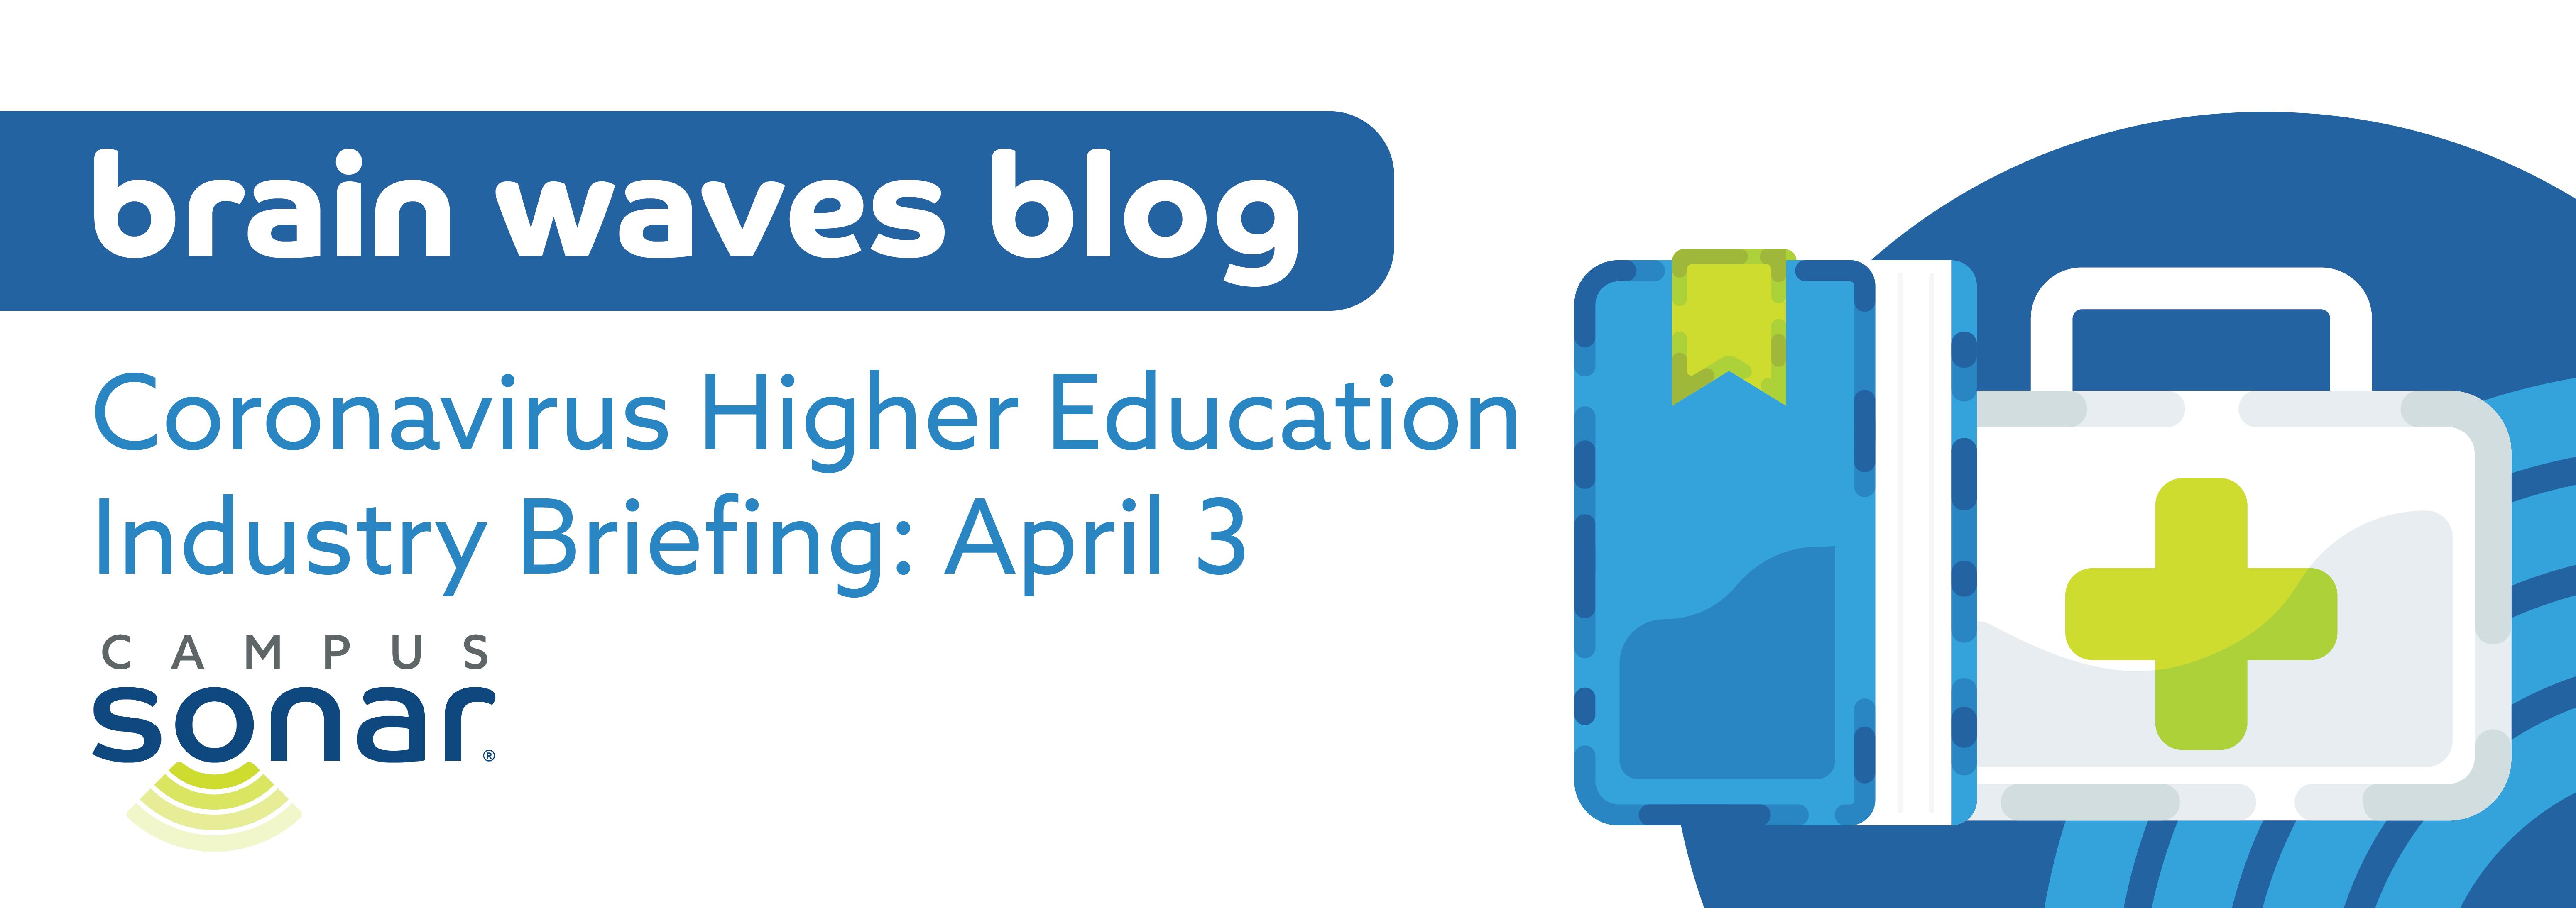 Blog Post image for Coronavirus Higher Education Industry Briefing: April 3